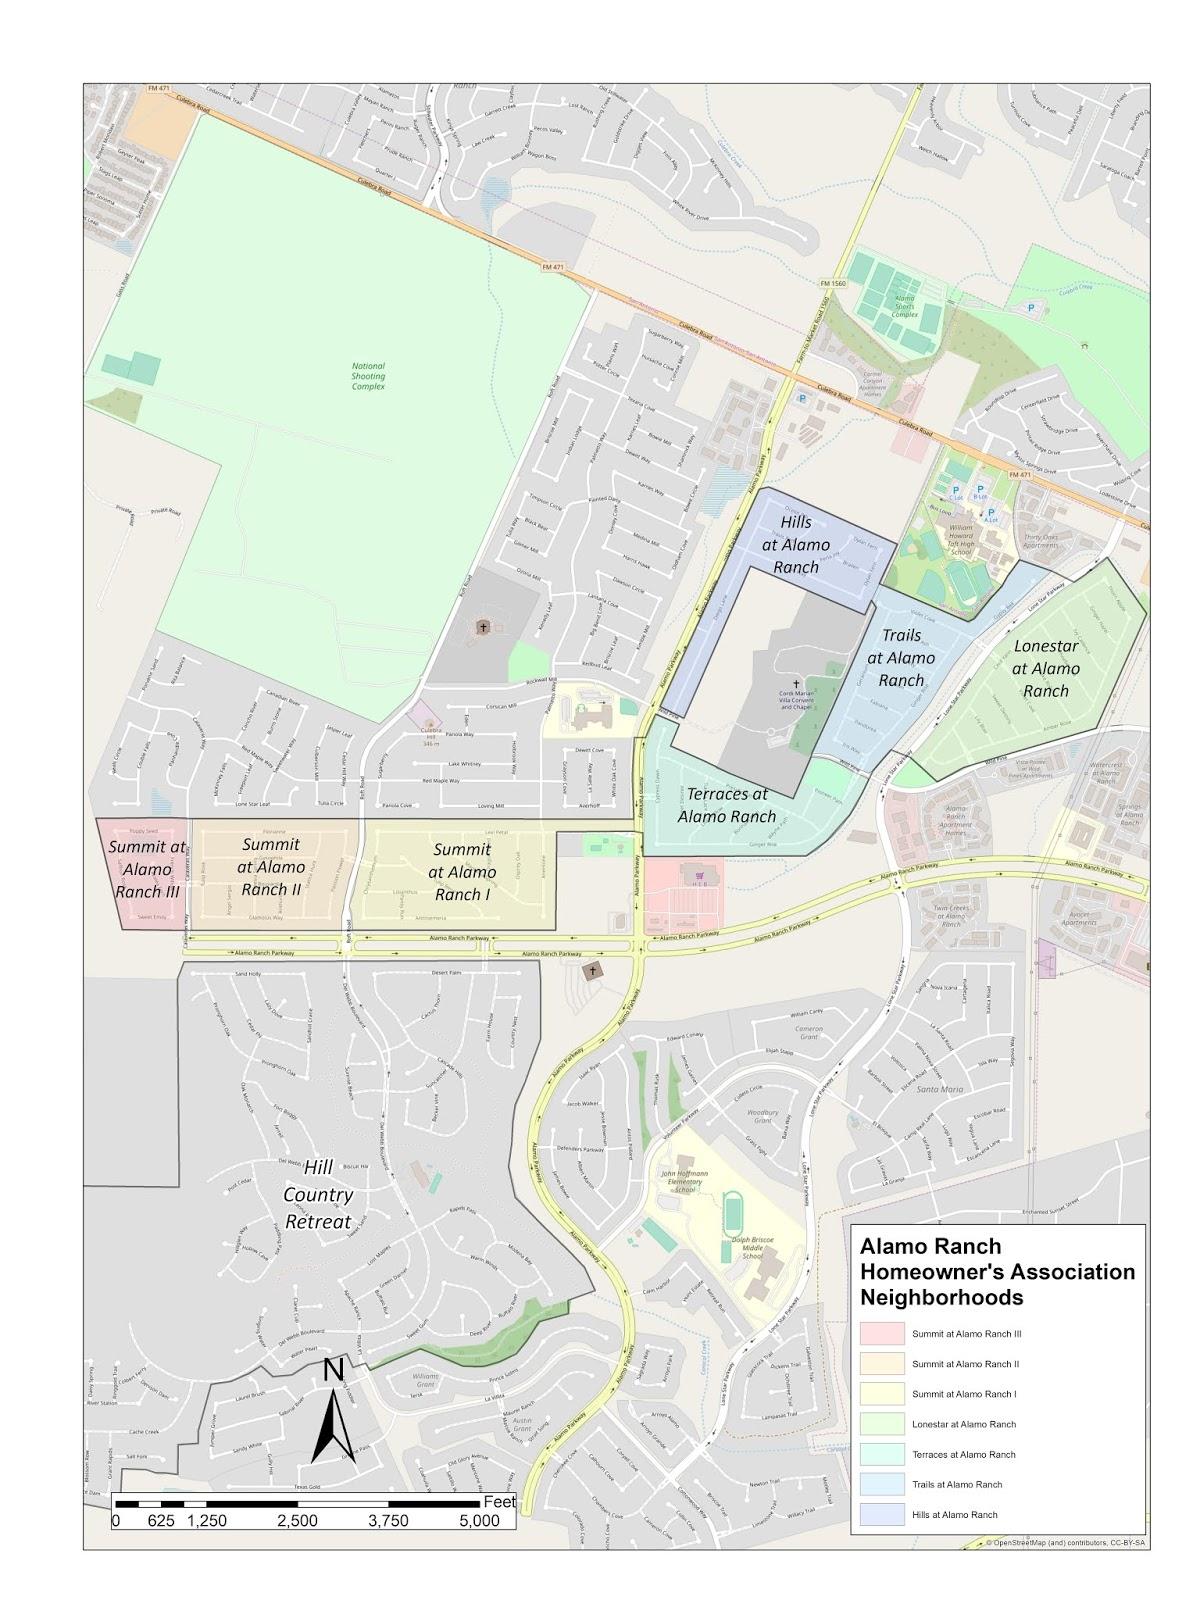 Alamo Ranch Maps: Detail map of Alamo Ranch Homeowner's